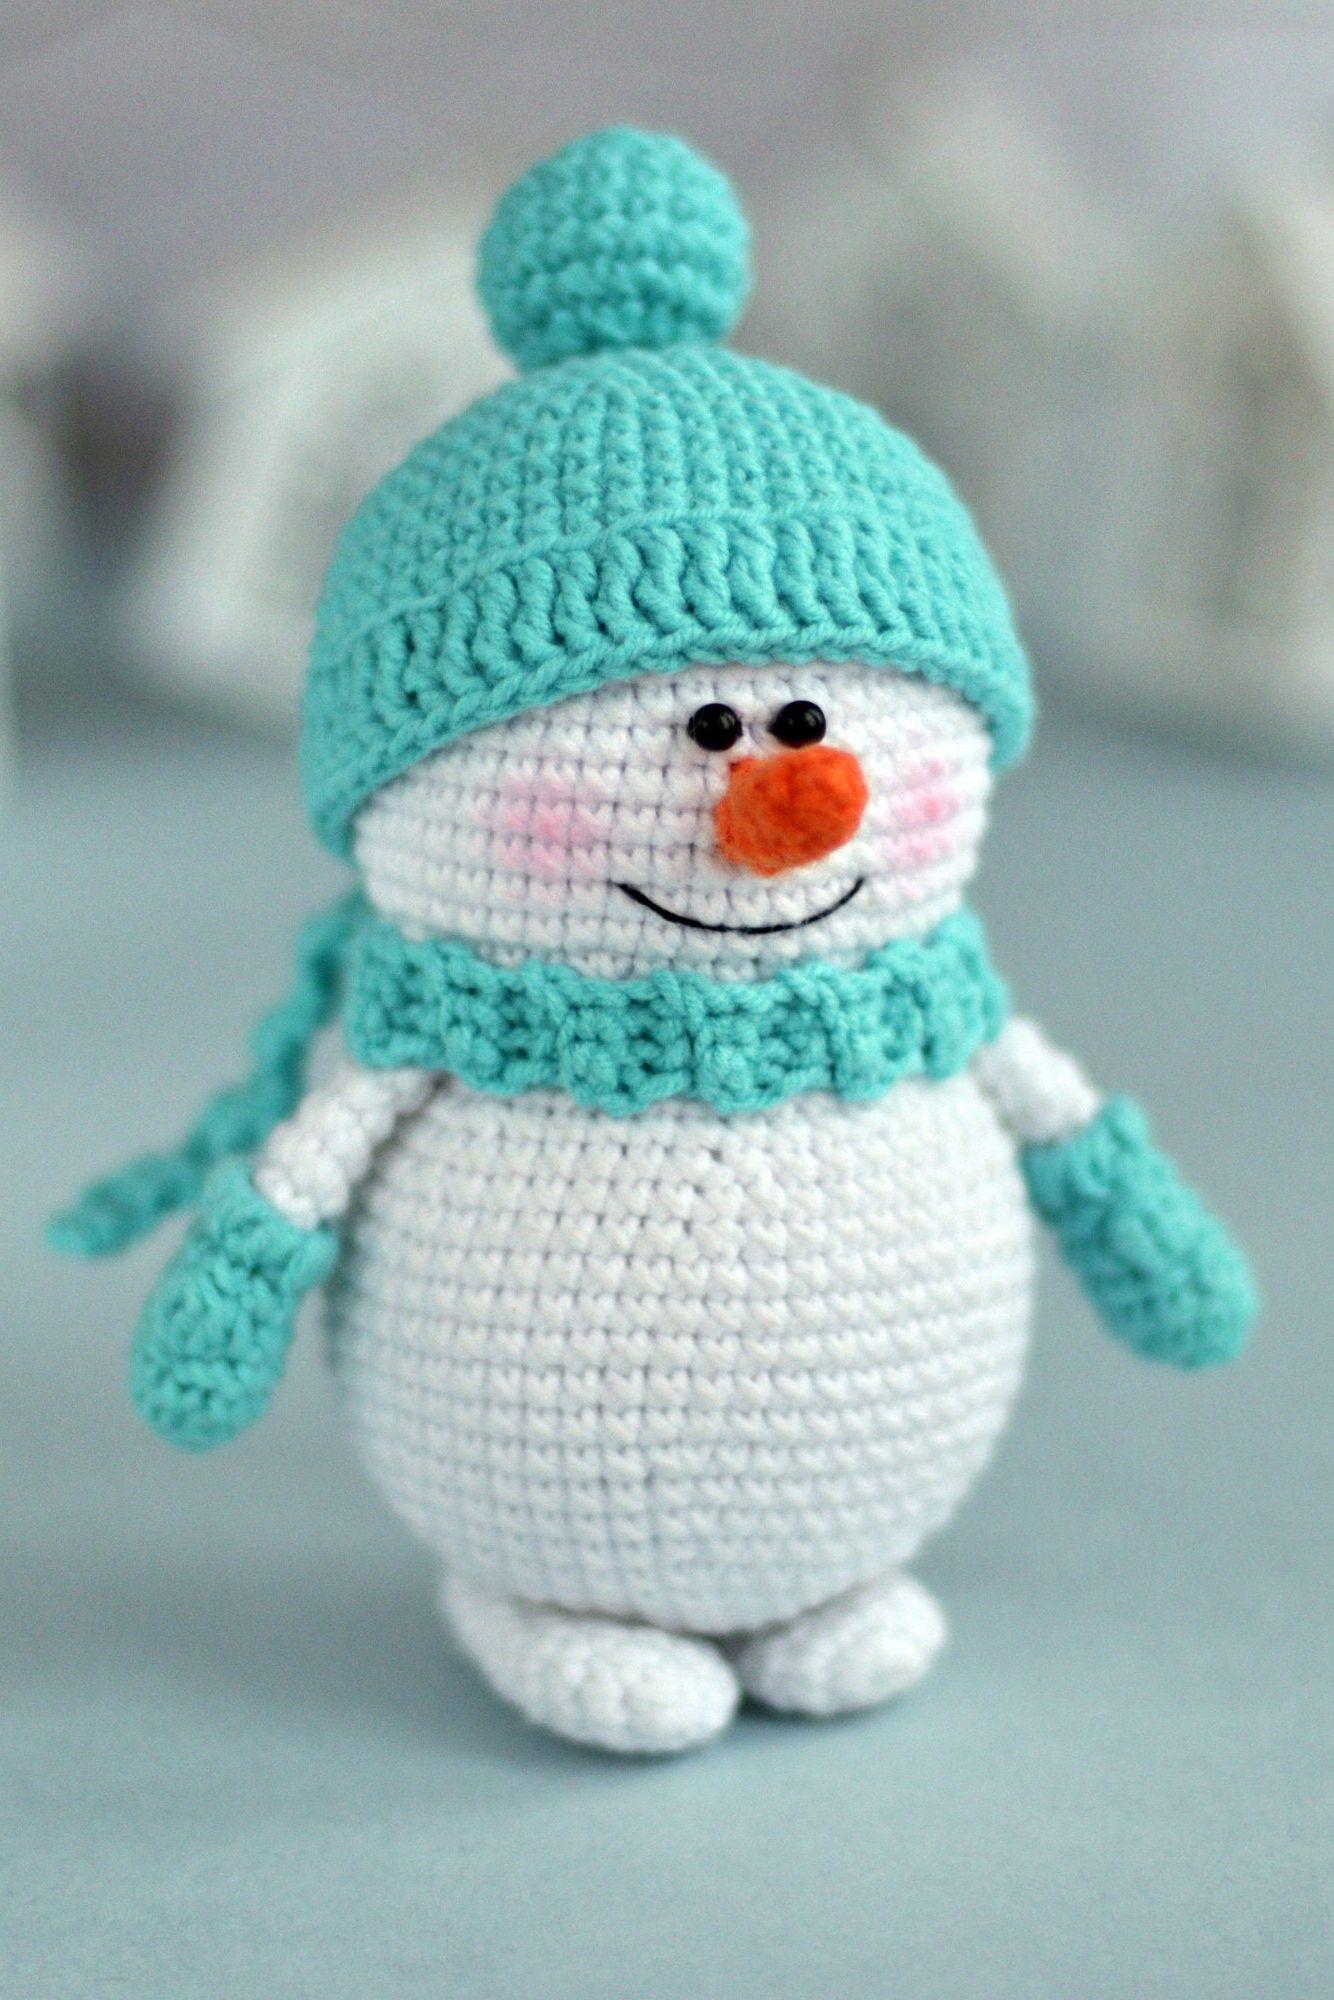 Snowman Crochet Pattern Christmas Toy New Year Decor Etsy Snowmen Patterns Crochet Snowman Crochet Patterns